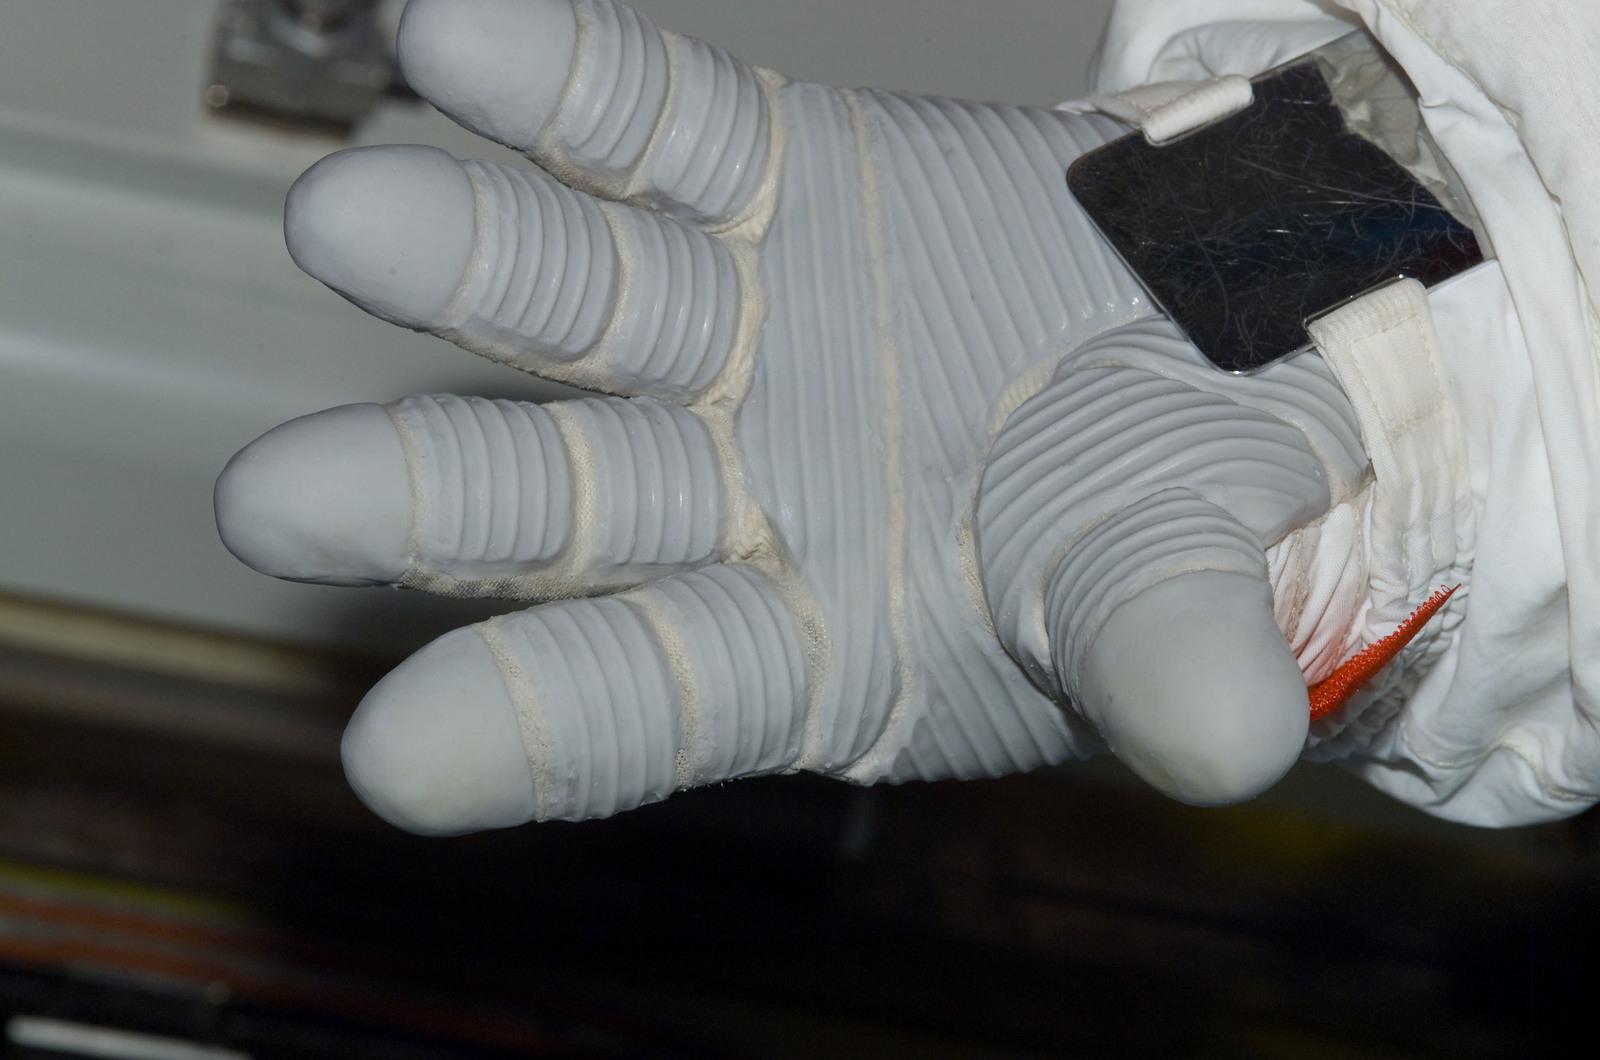 S122E008705 - STS-122 - Inspection of EMU Glove after EVA 3